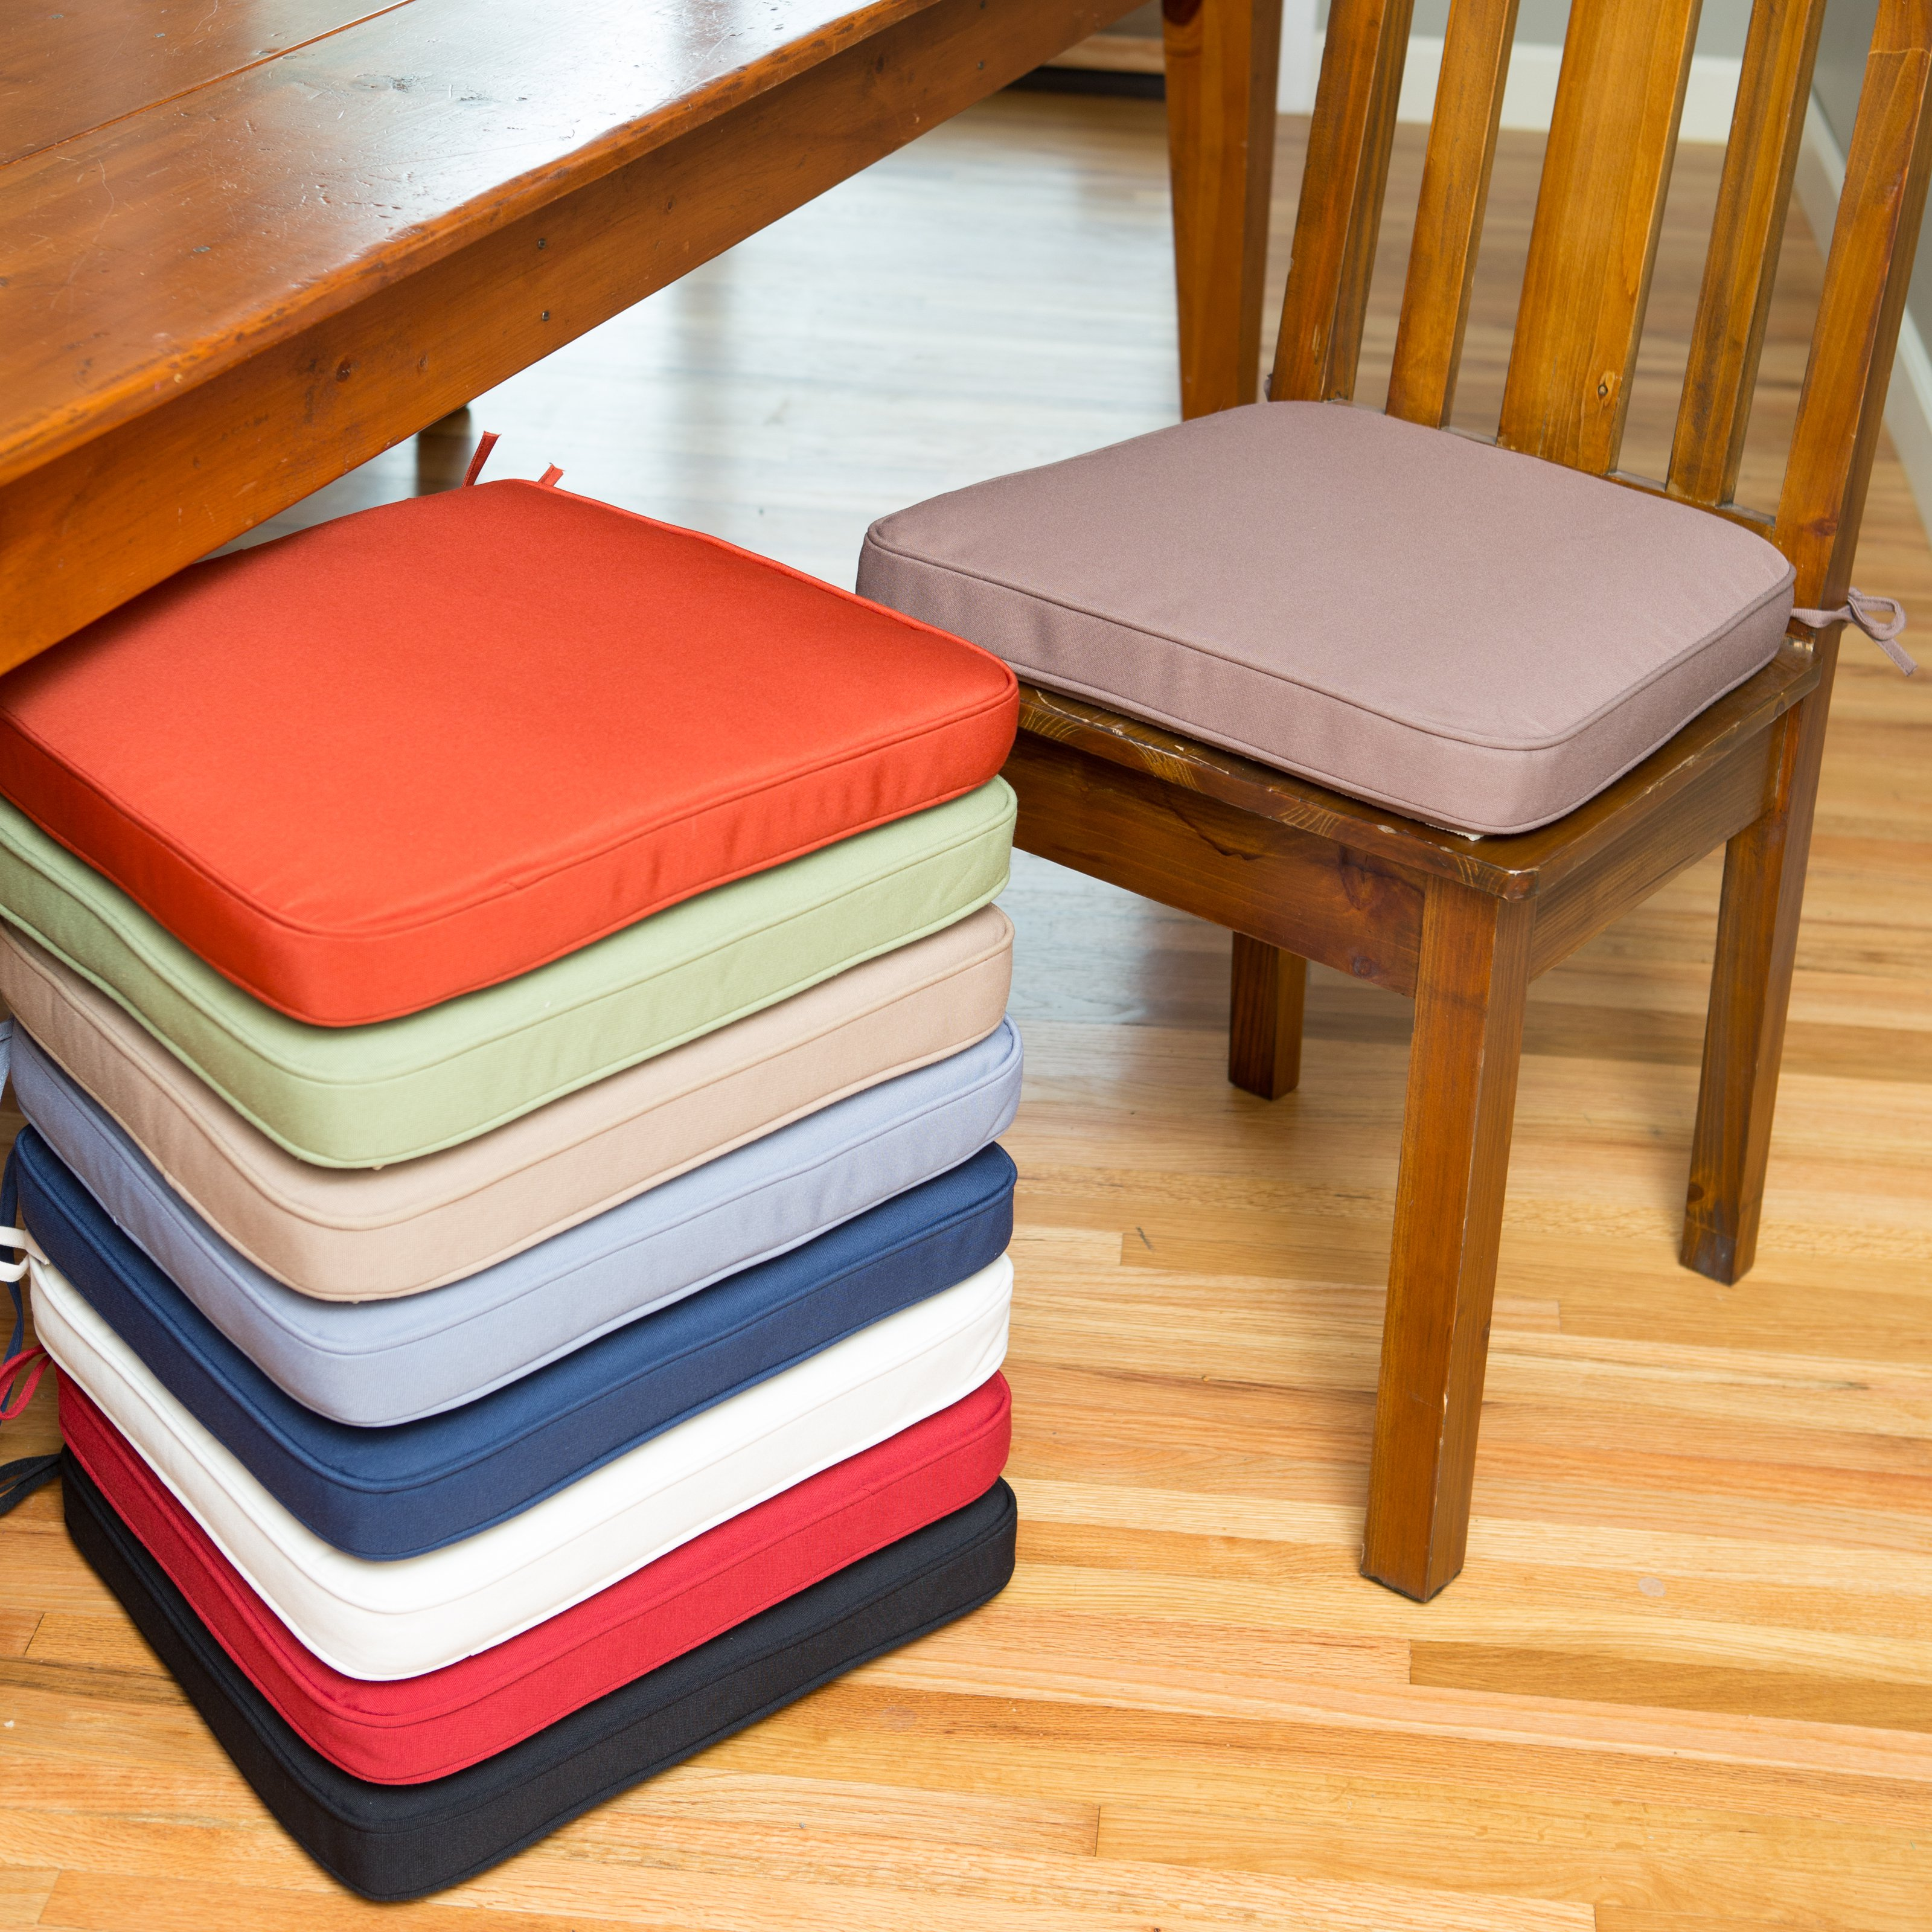 Chair cushions Dining room chair cushions |  Hayneedle XUBEXWM